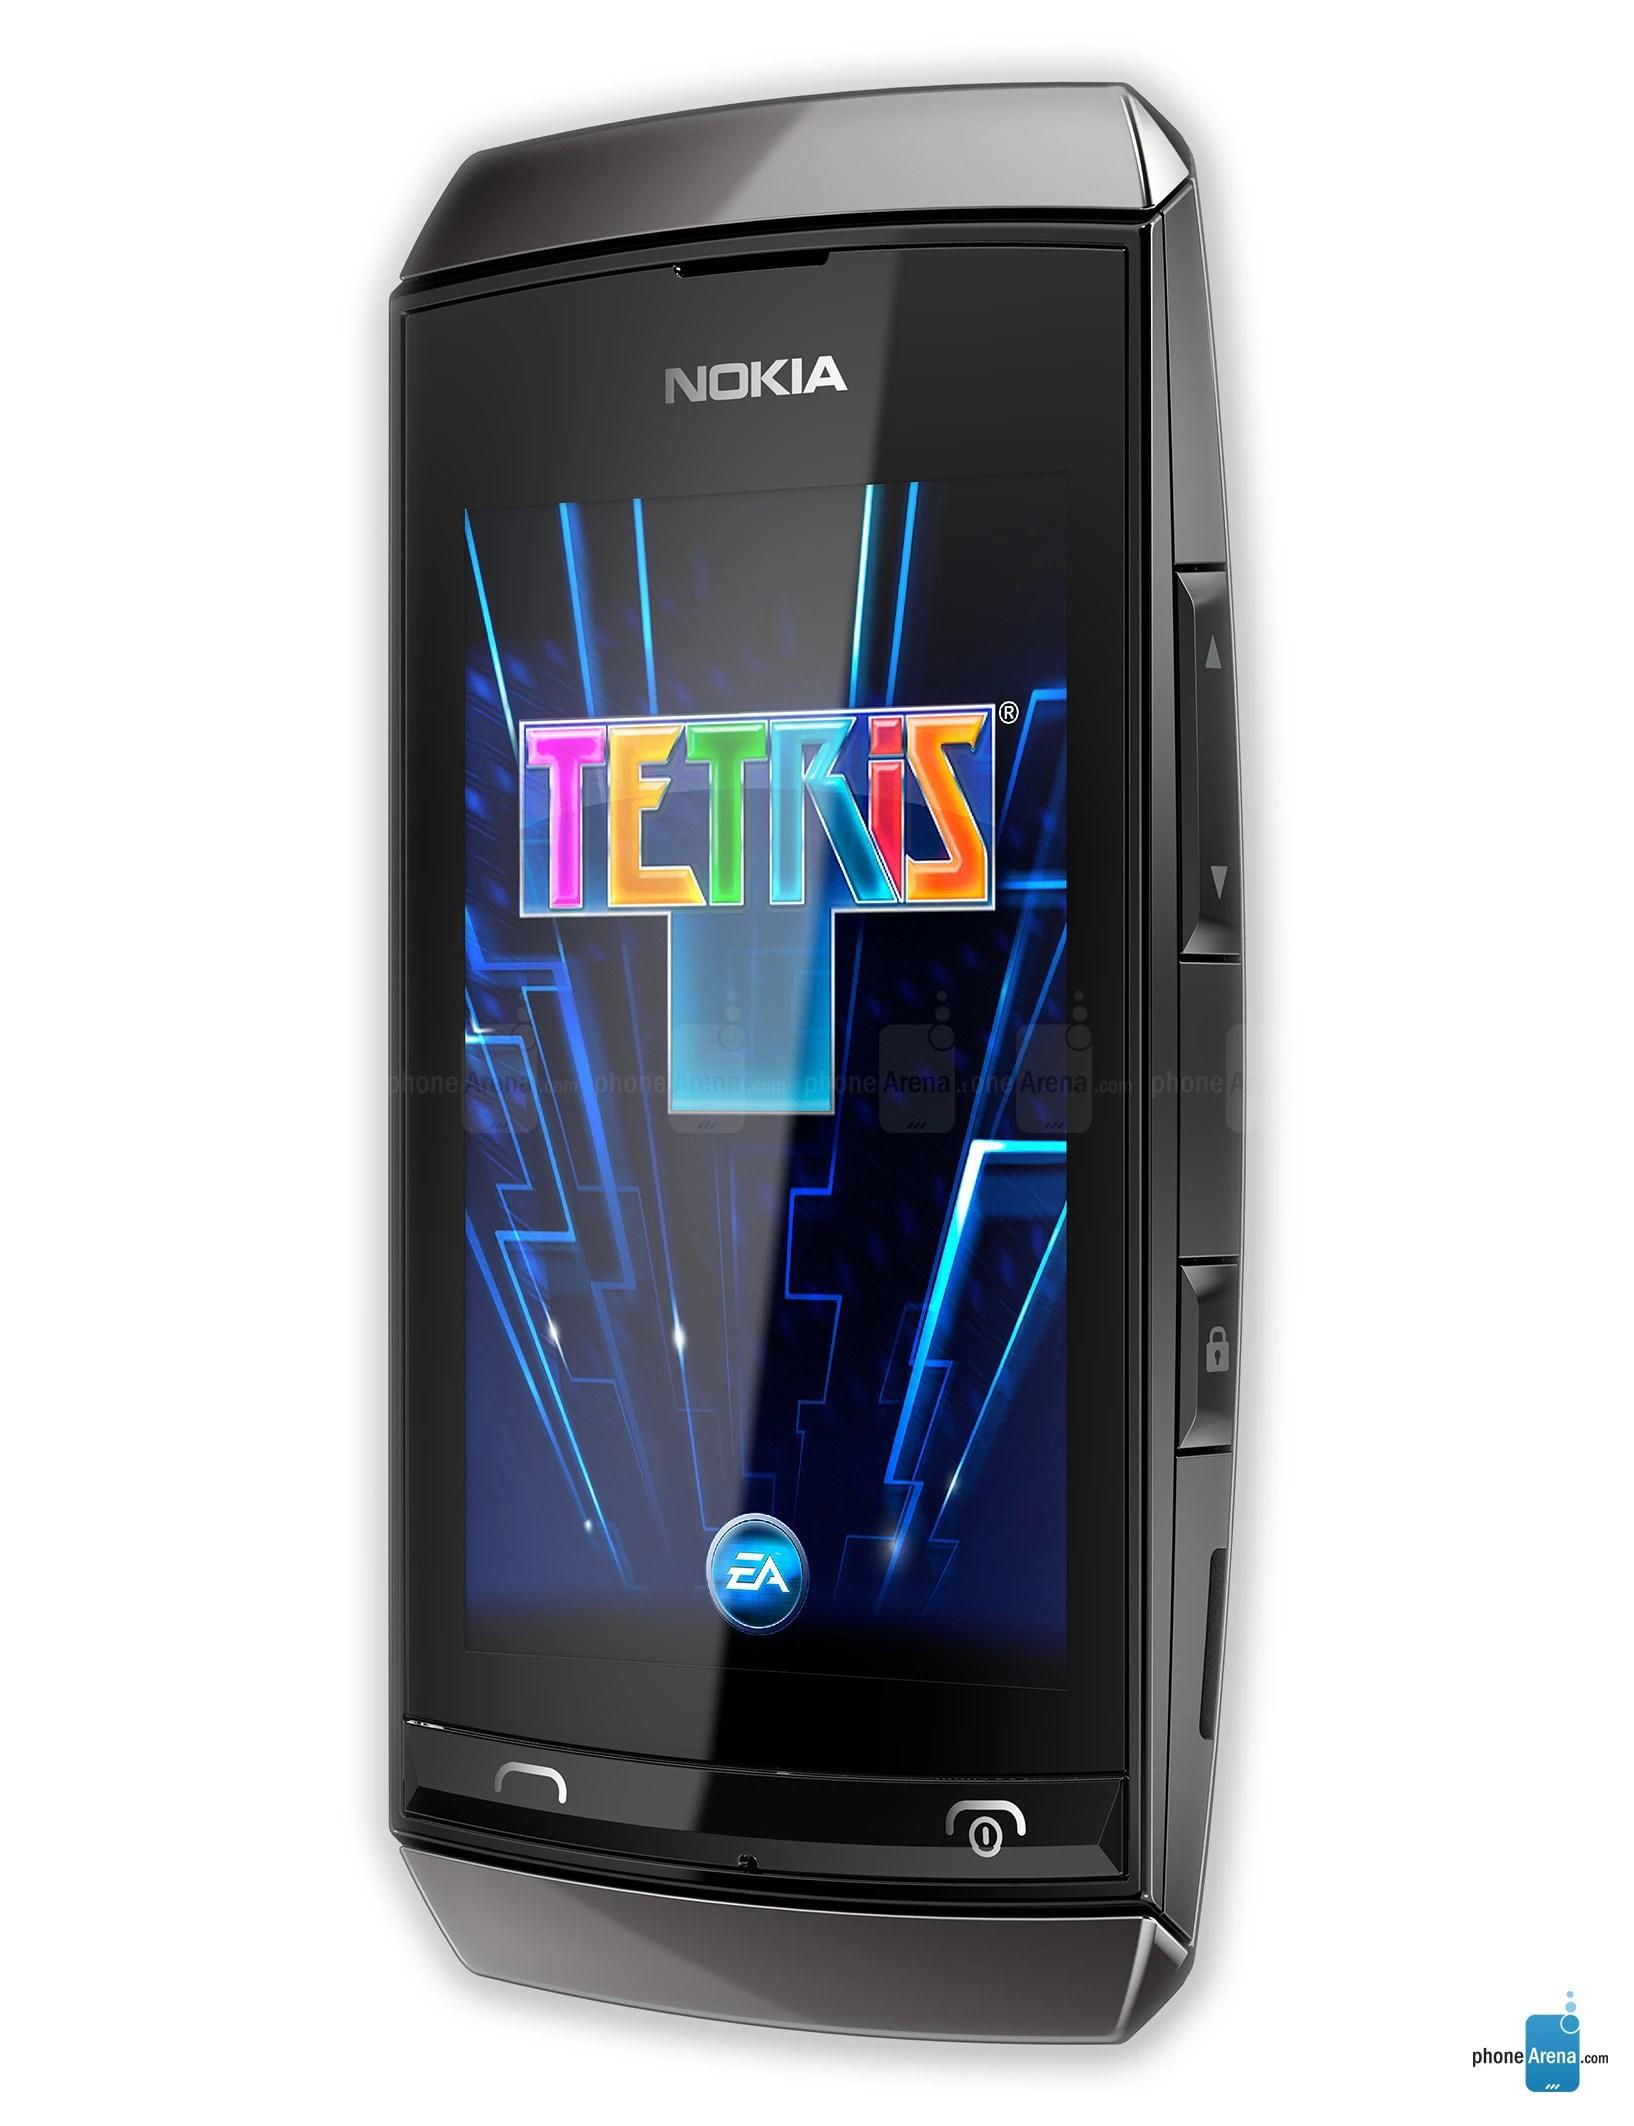 Nokia Asha 306 specs